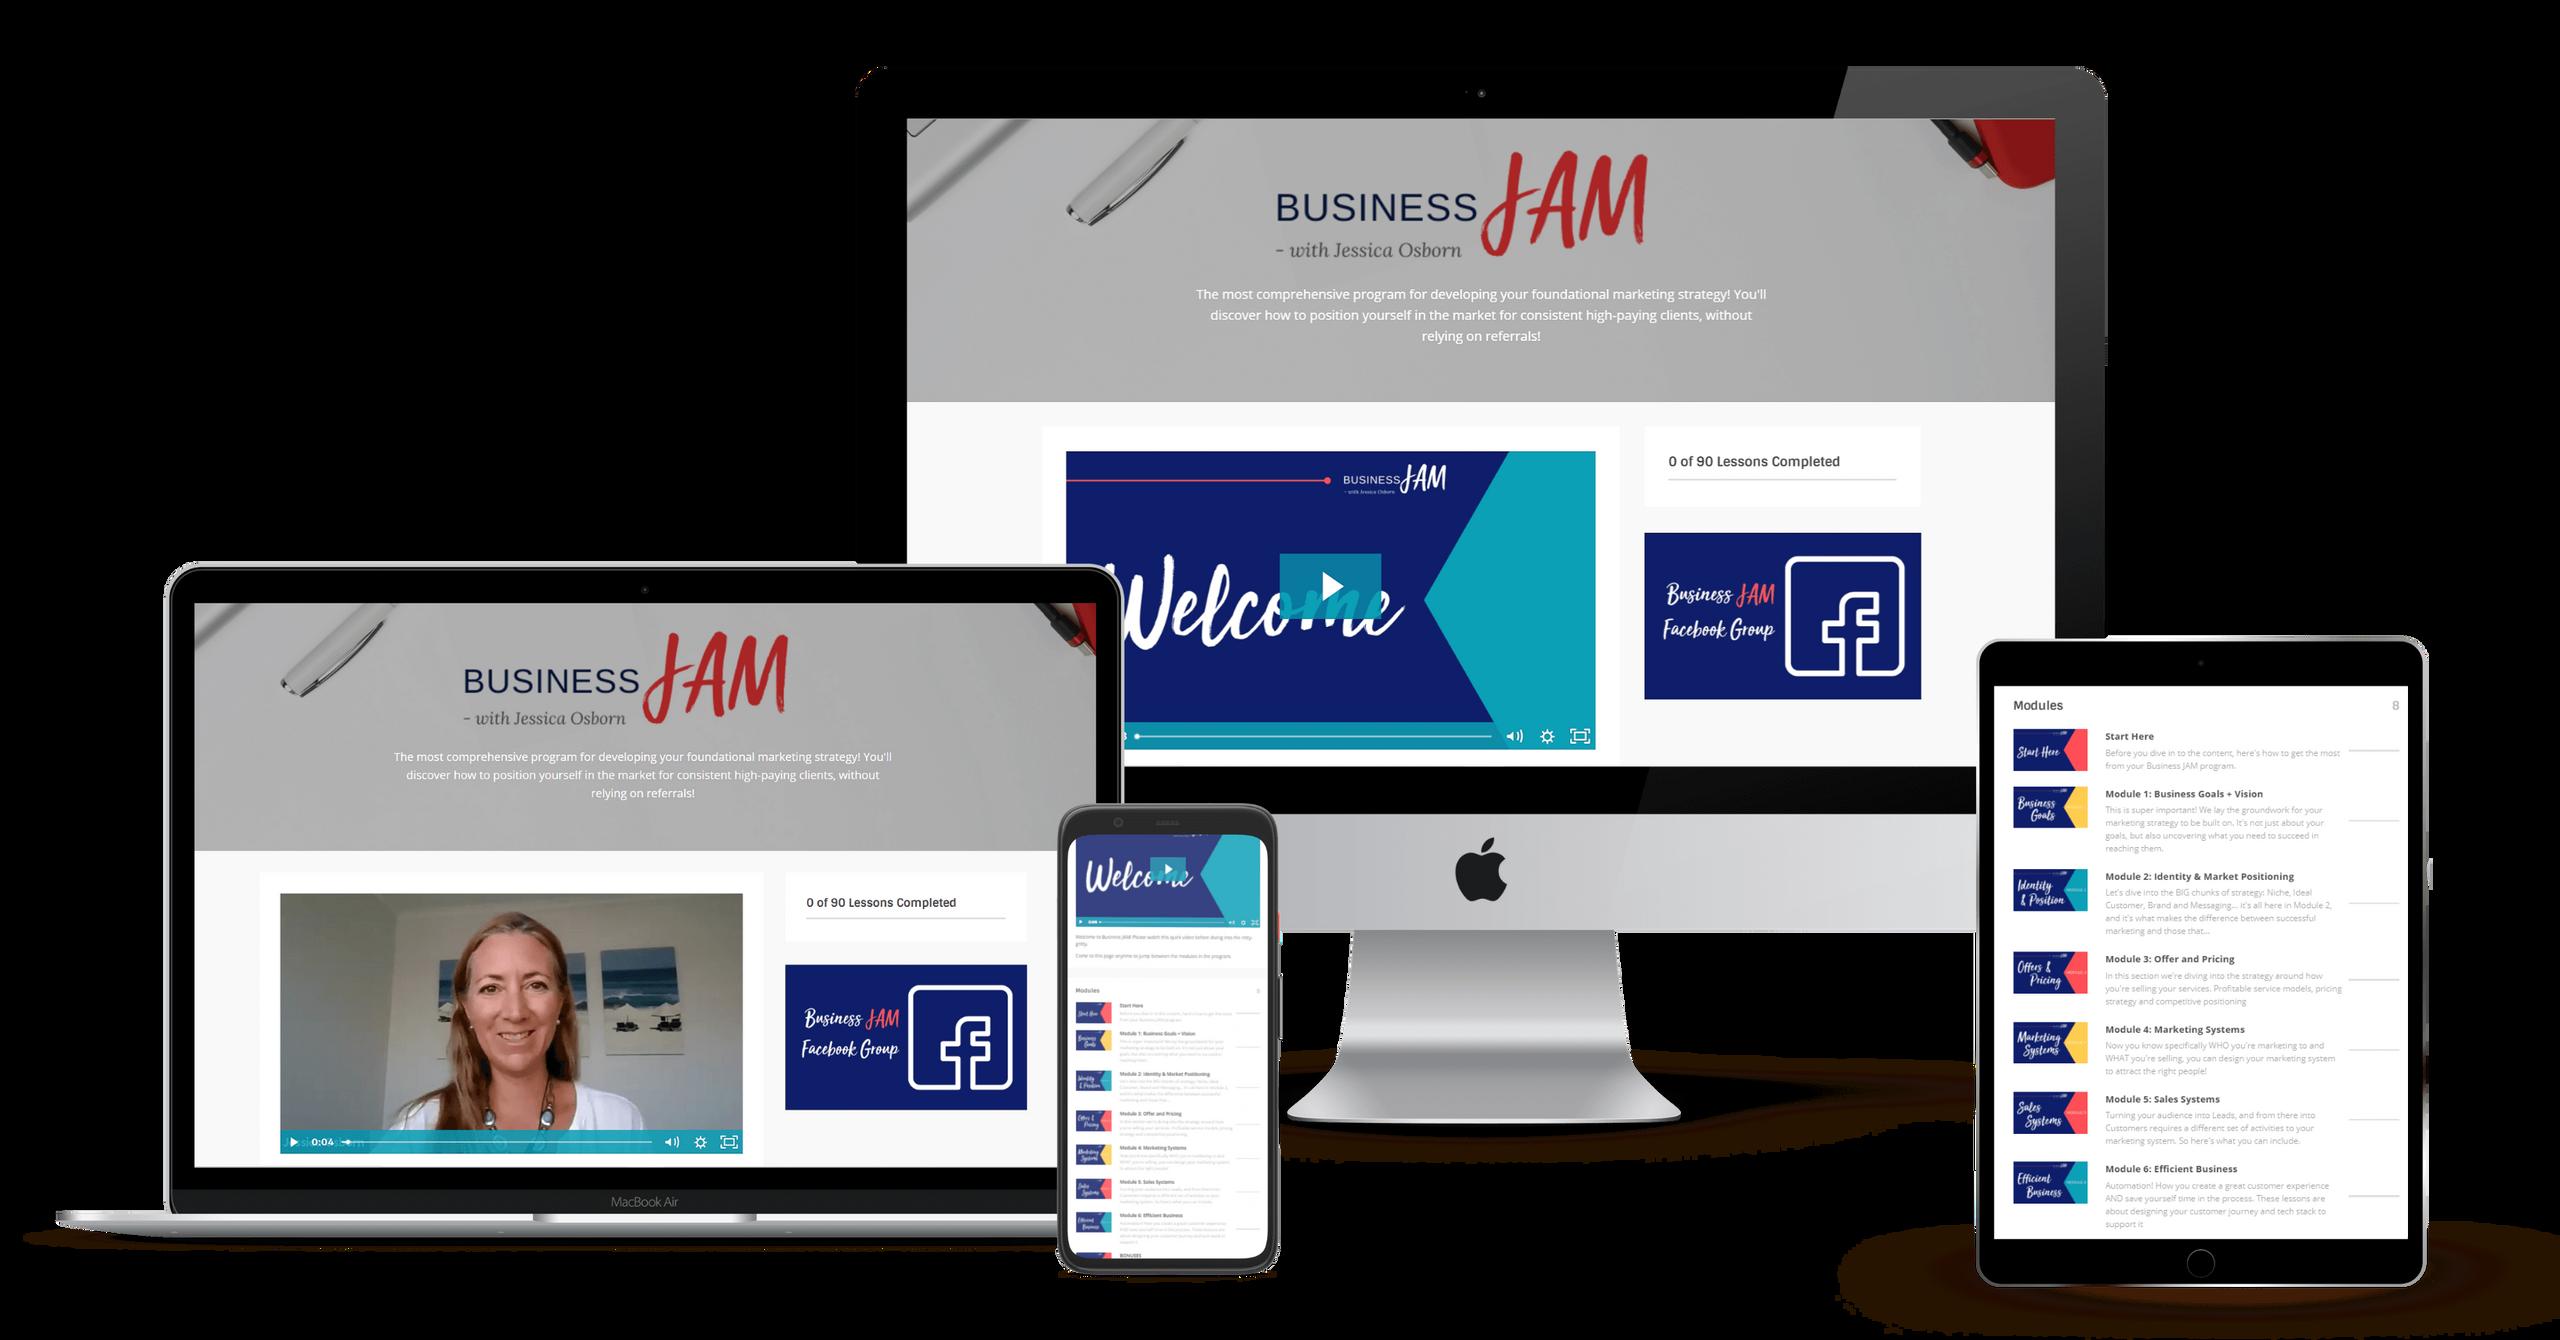 Business JAM program by Jessica Osborn screenshots